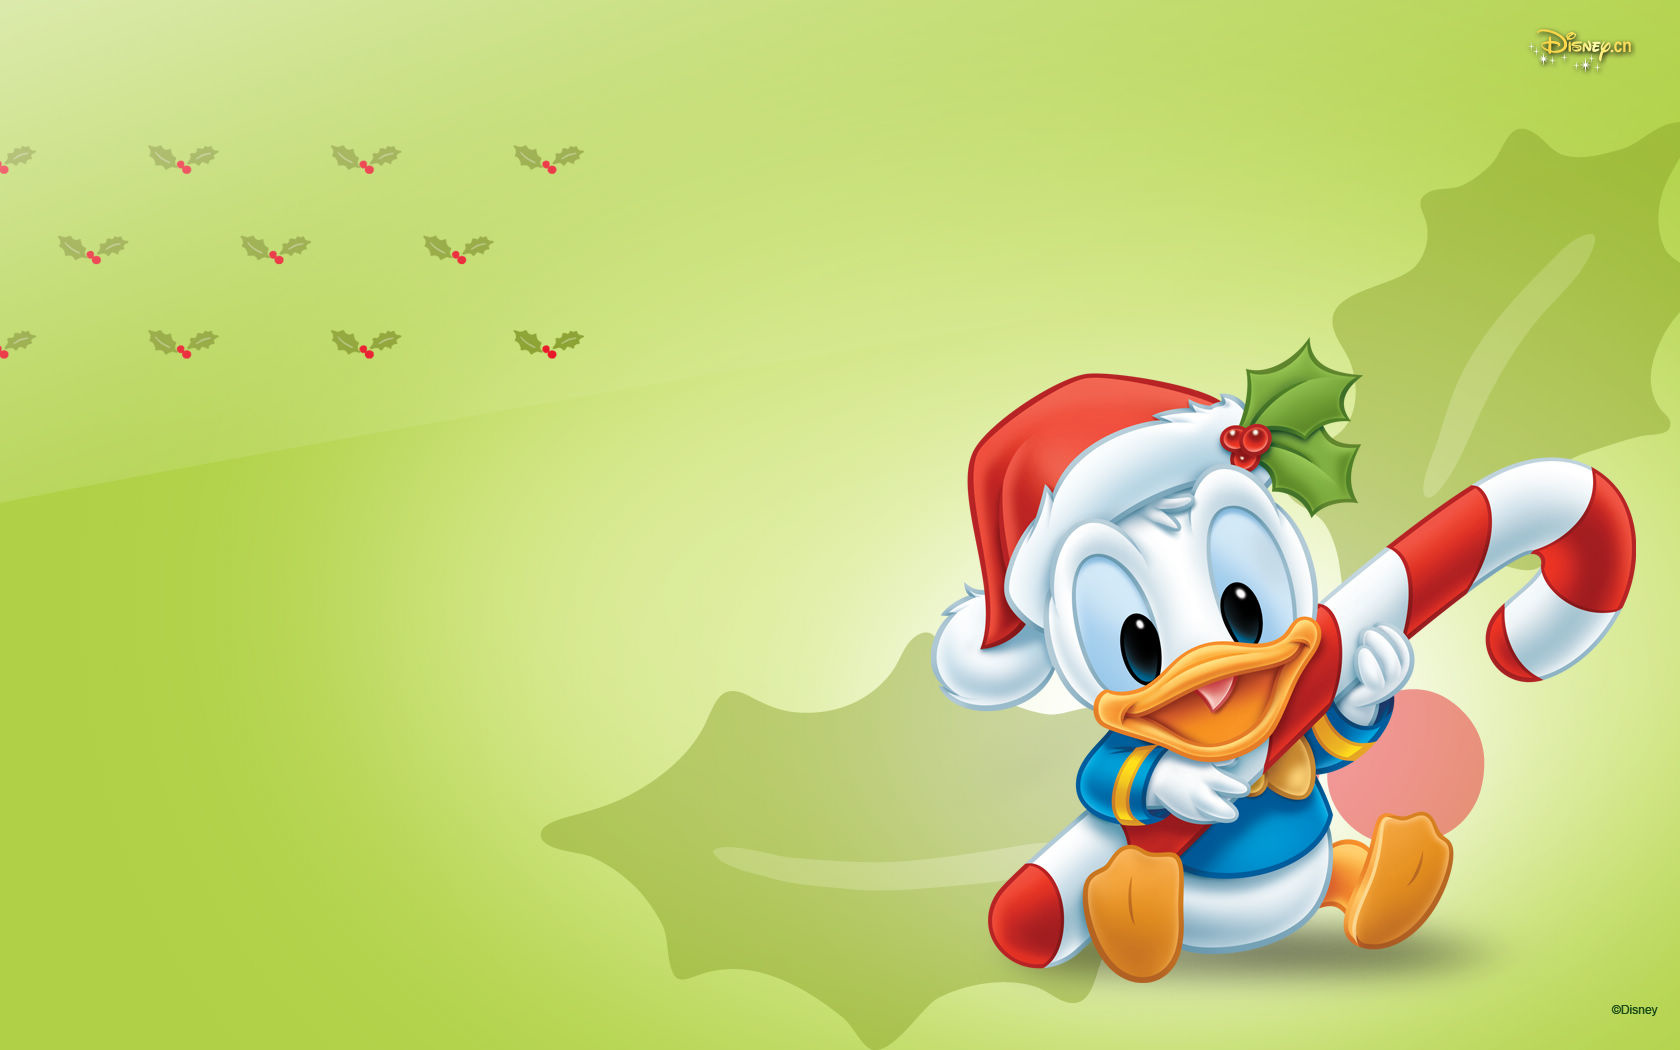 Fondos De Pantalla Del Pato Donald Wallpapers HD Para Descargar Gratis